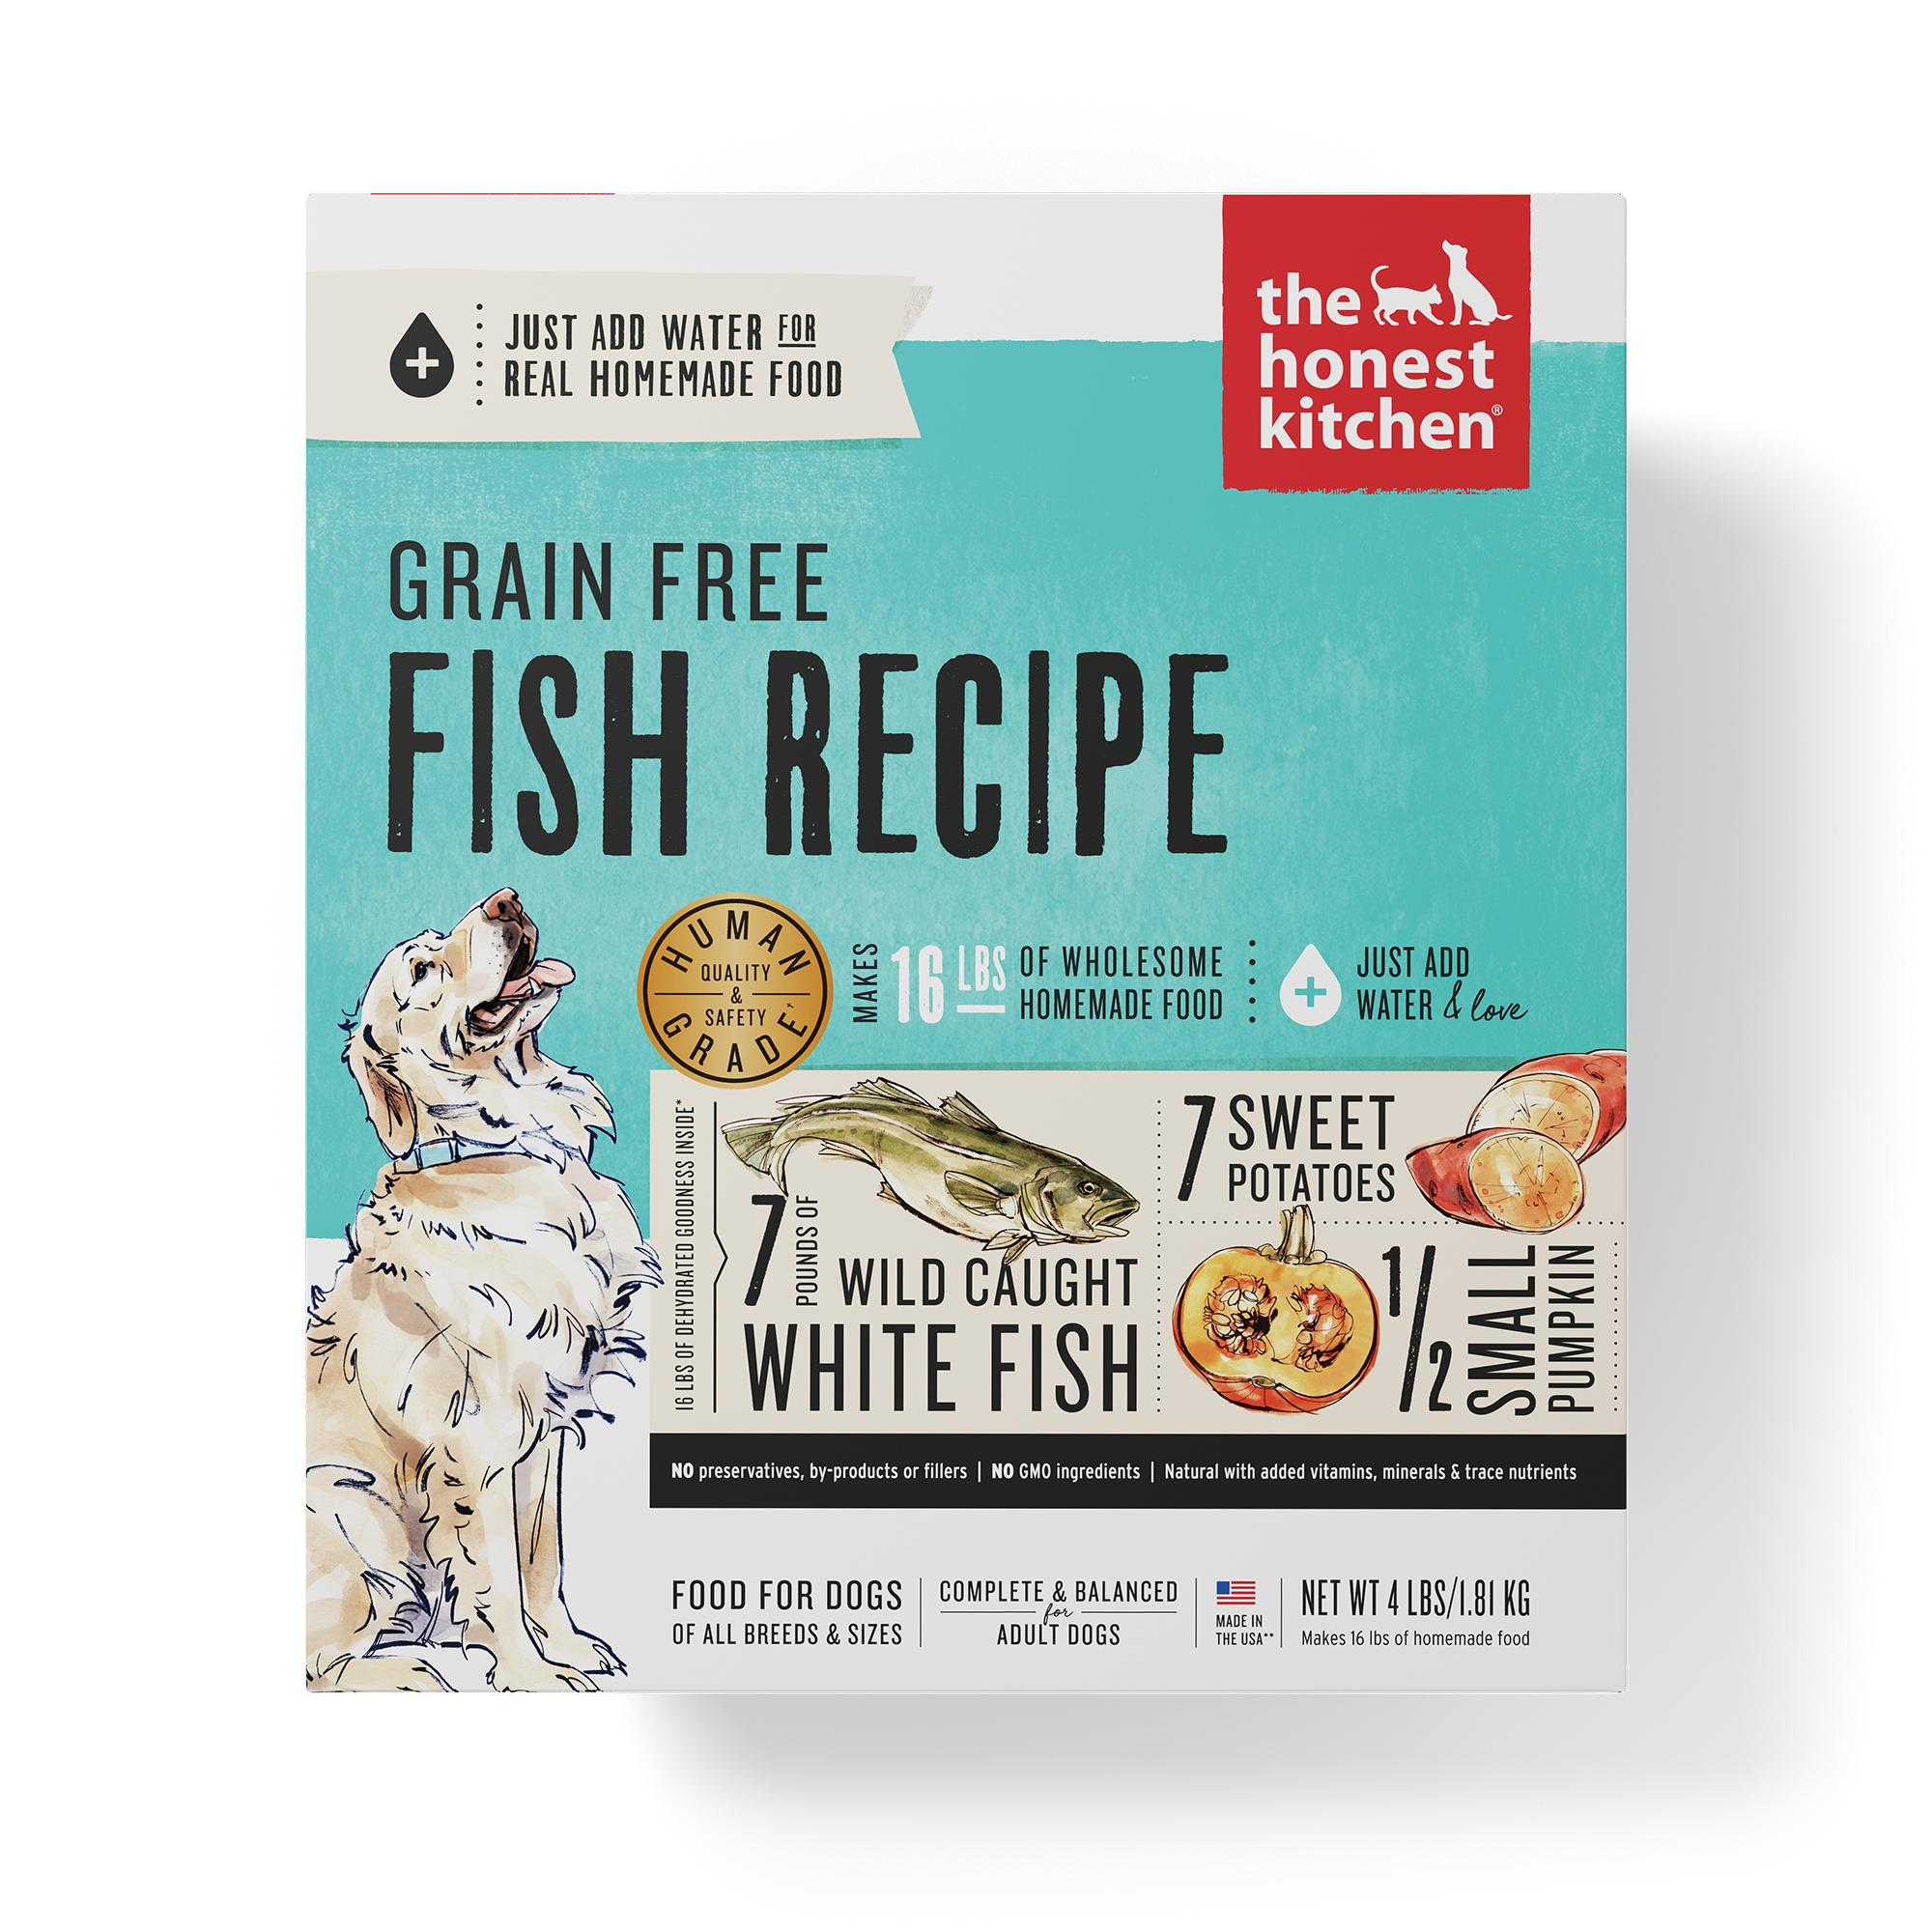 The Honest Kitchen Fish Recipe Grain-Free Dehydrated Dog Food, 4-lb box